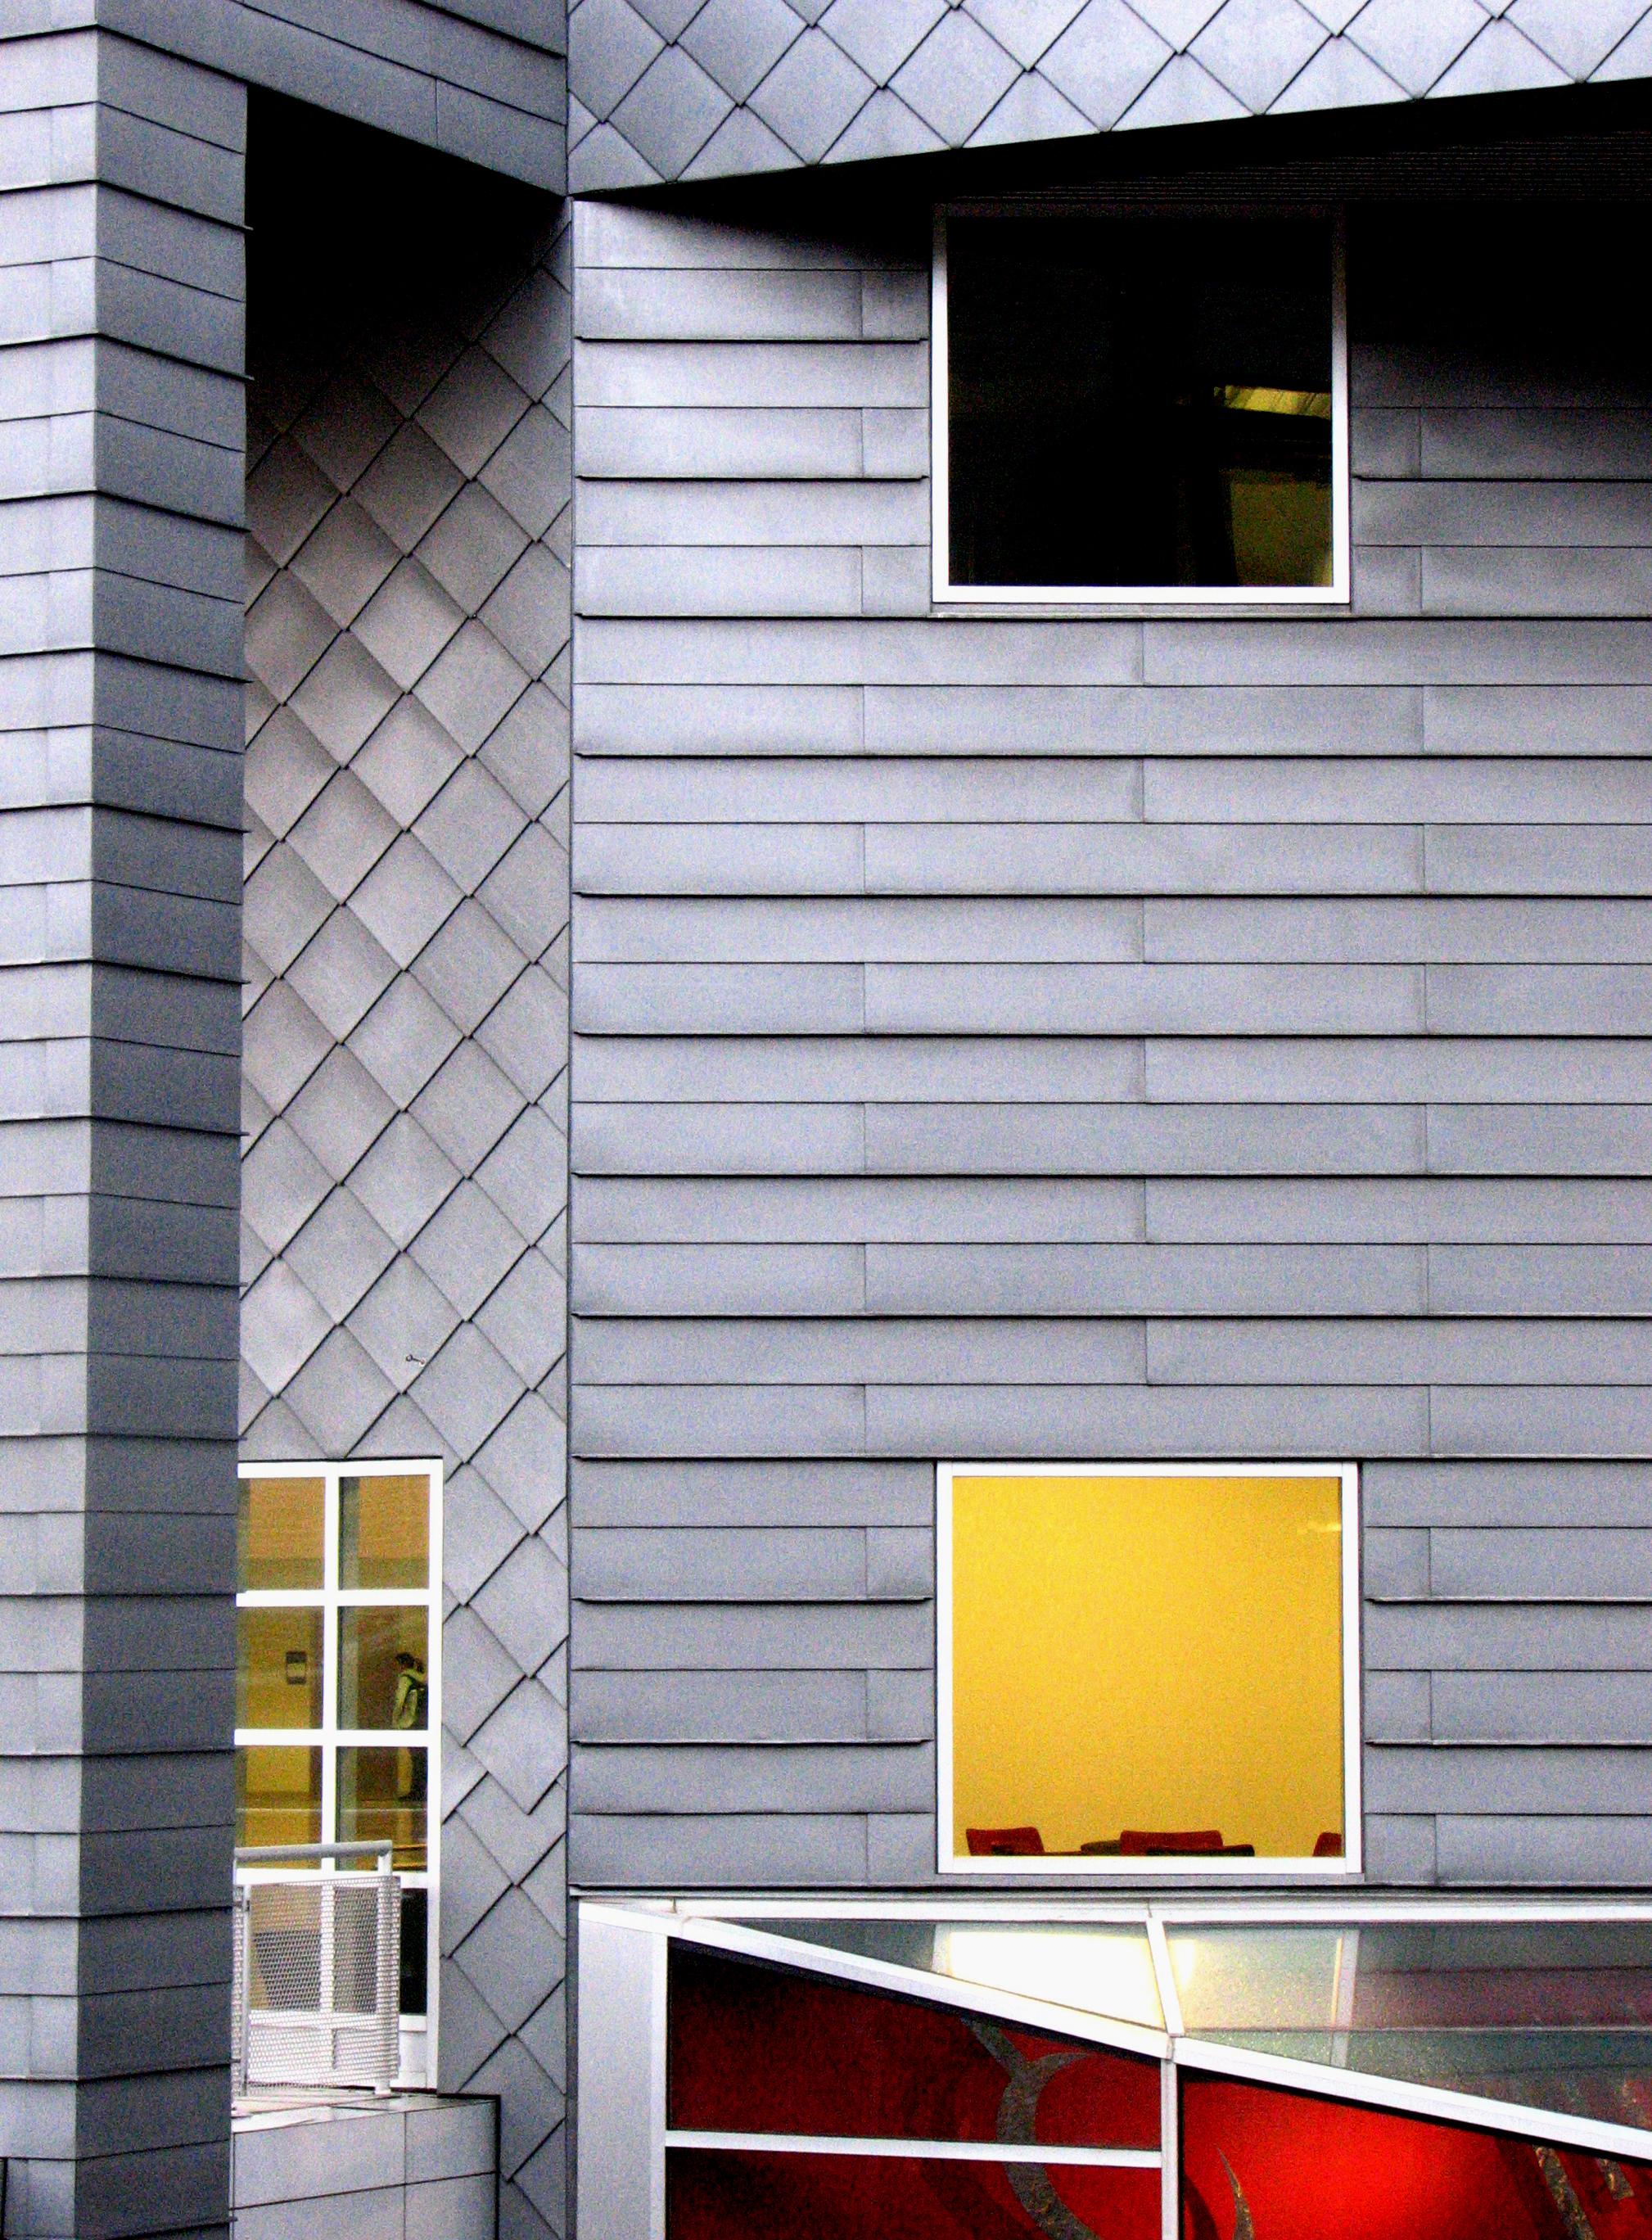 ... photo explore facade door material interior design photos de university window blind fotografie explored c&us siding uc arhitectura ... & Free Images : architecture wood photography house home wall ...